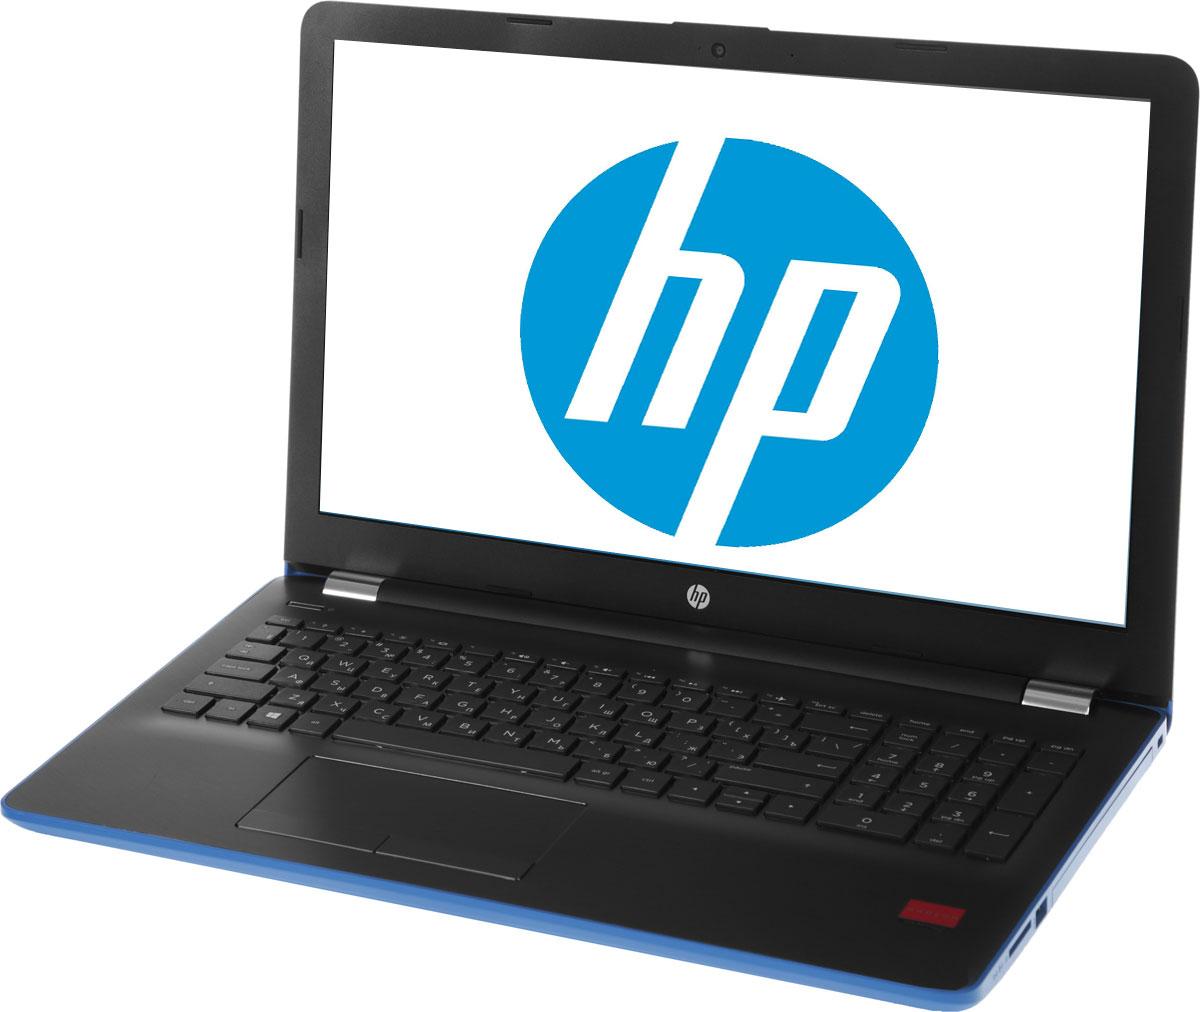 HP 15-bw534ur, Blue (2FQ71EA)